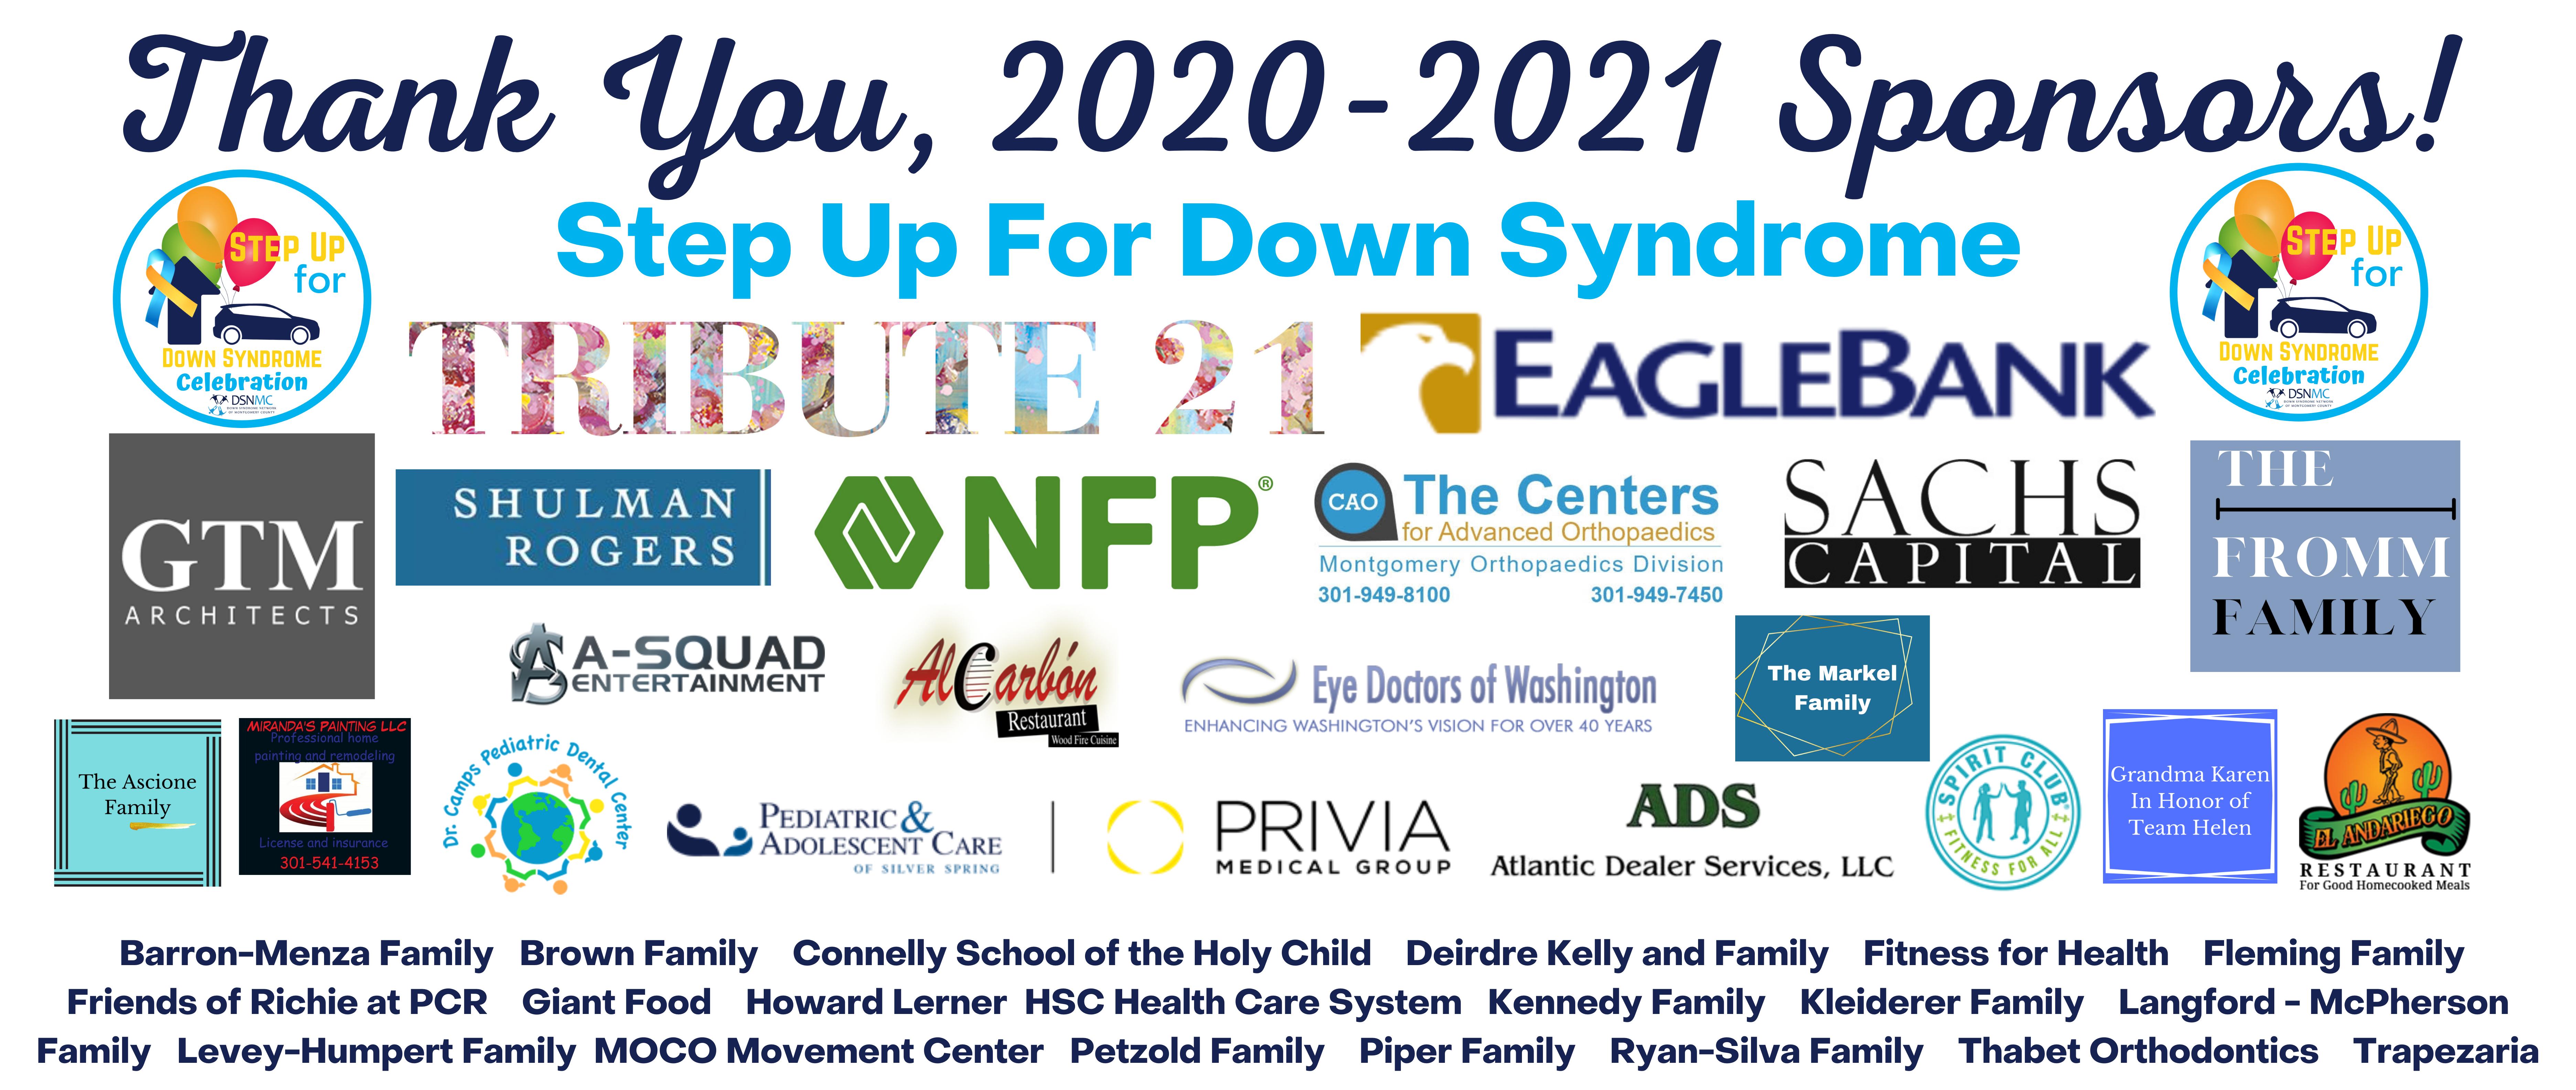 Thank You Sponsors 2020-2021